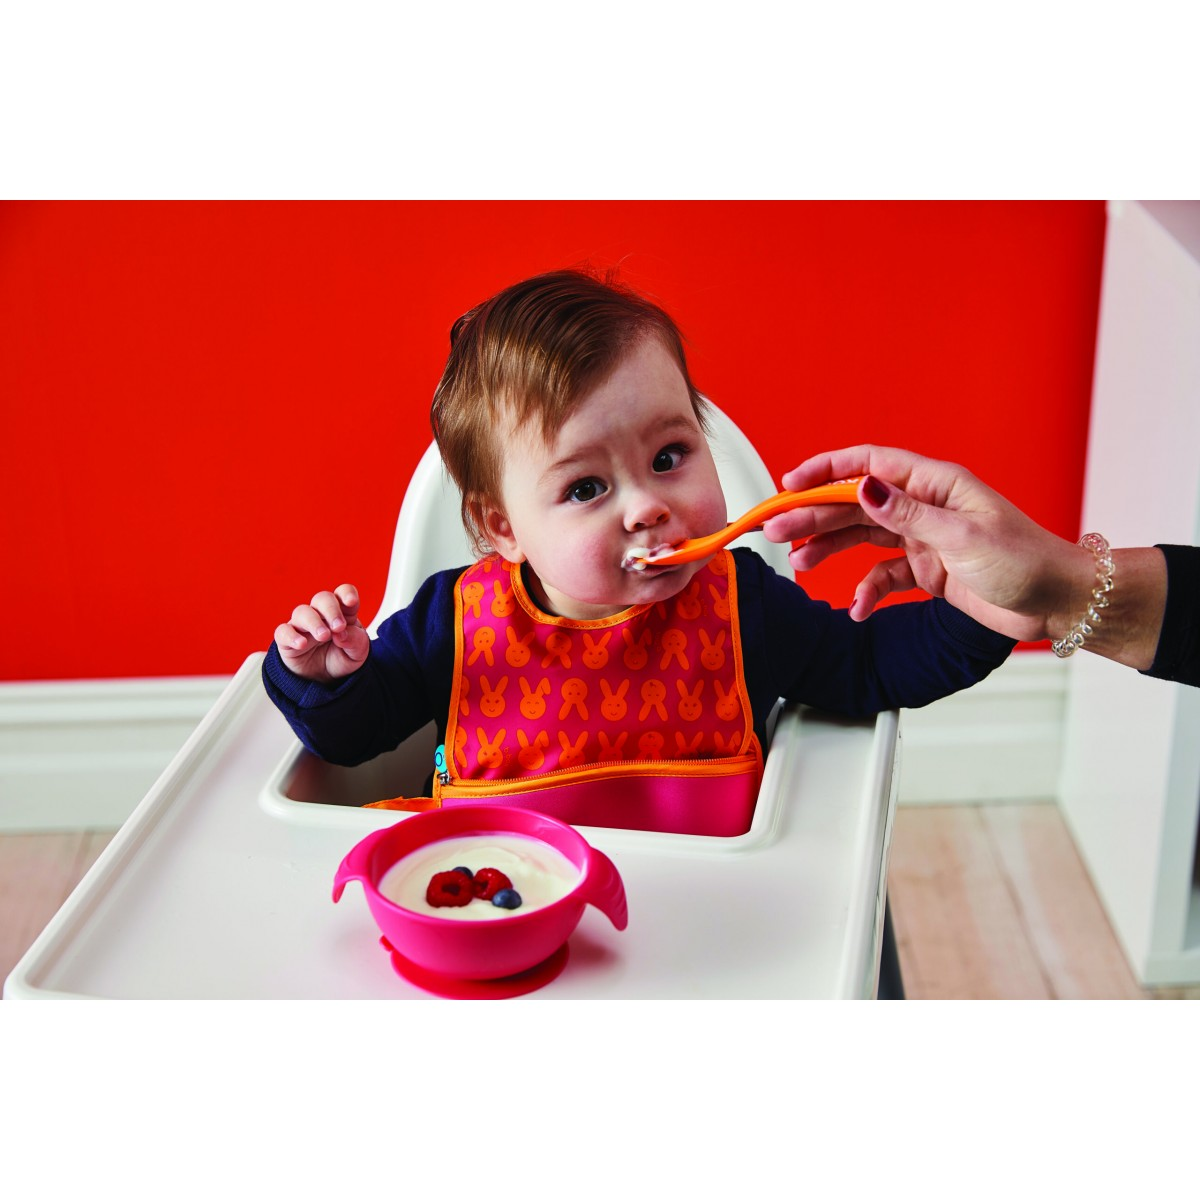 Silione First Feeding Bowl Set with Spoon - Strawberry Shake Pink Orange